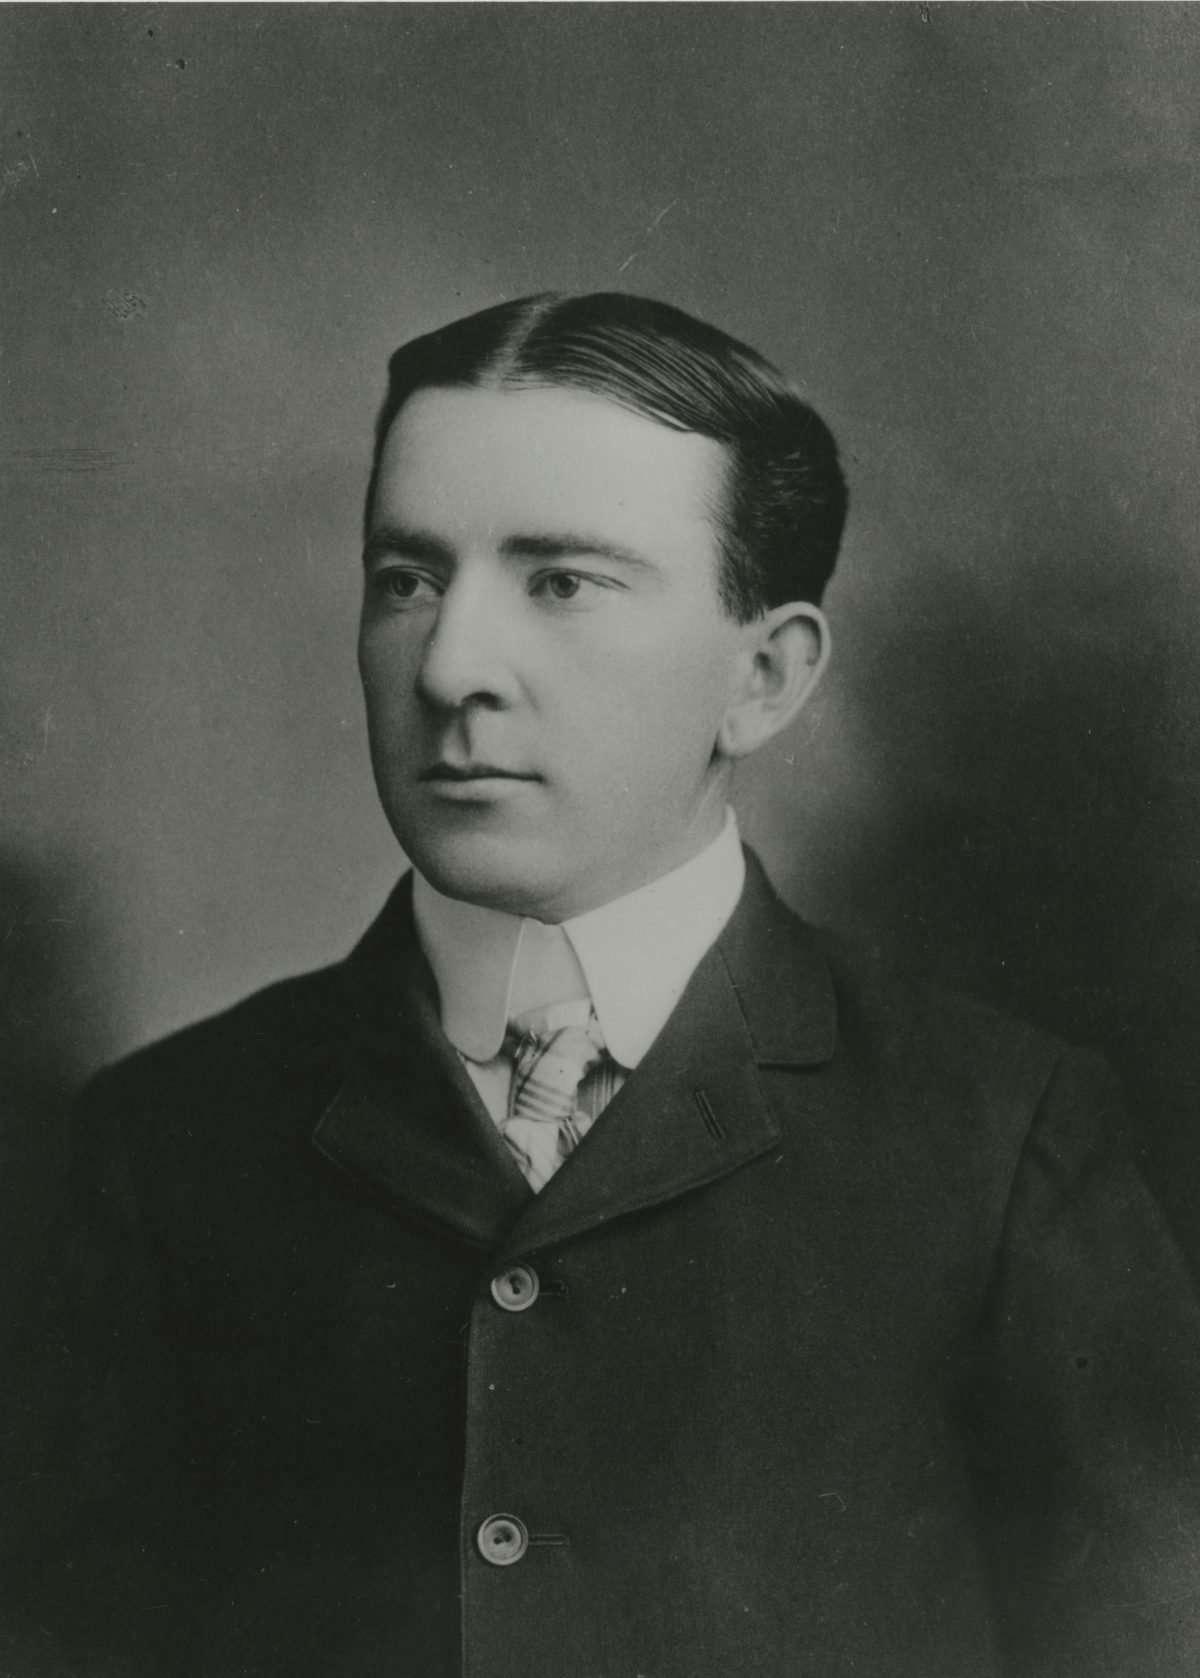 Robert William Blair